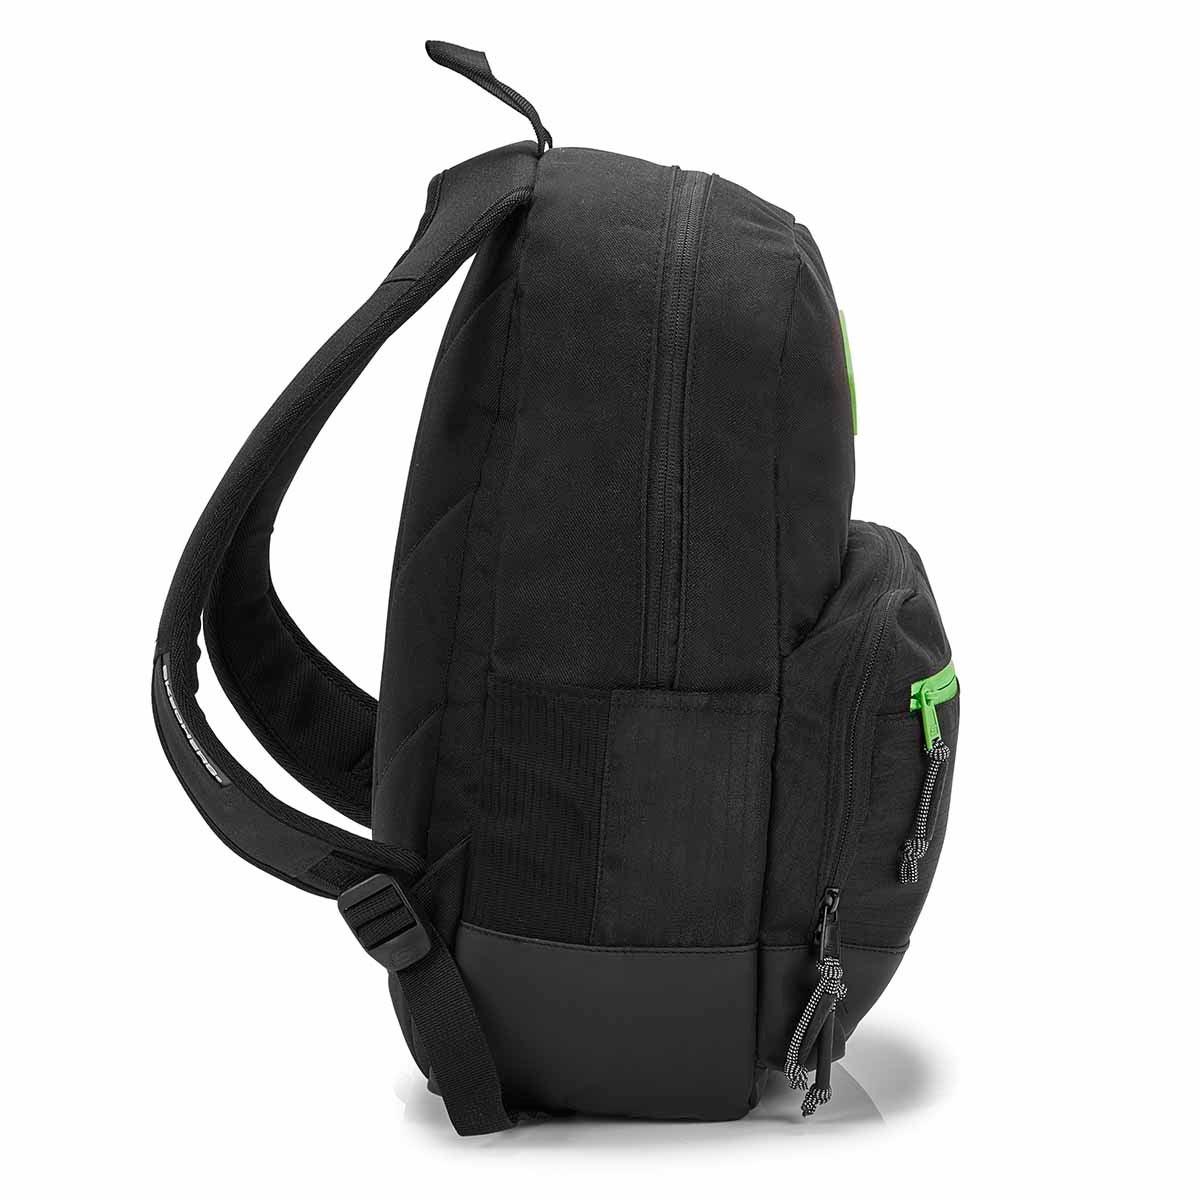 Unisex Larimer black/ lime backpack